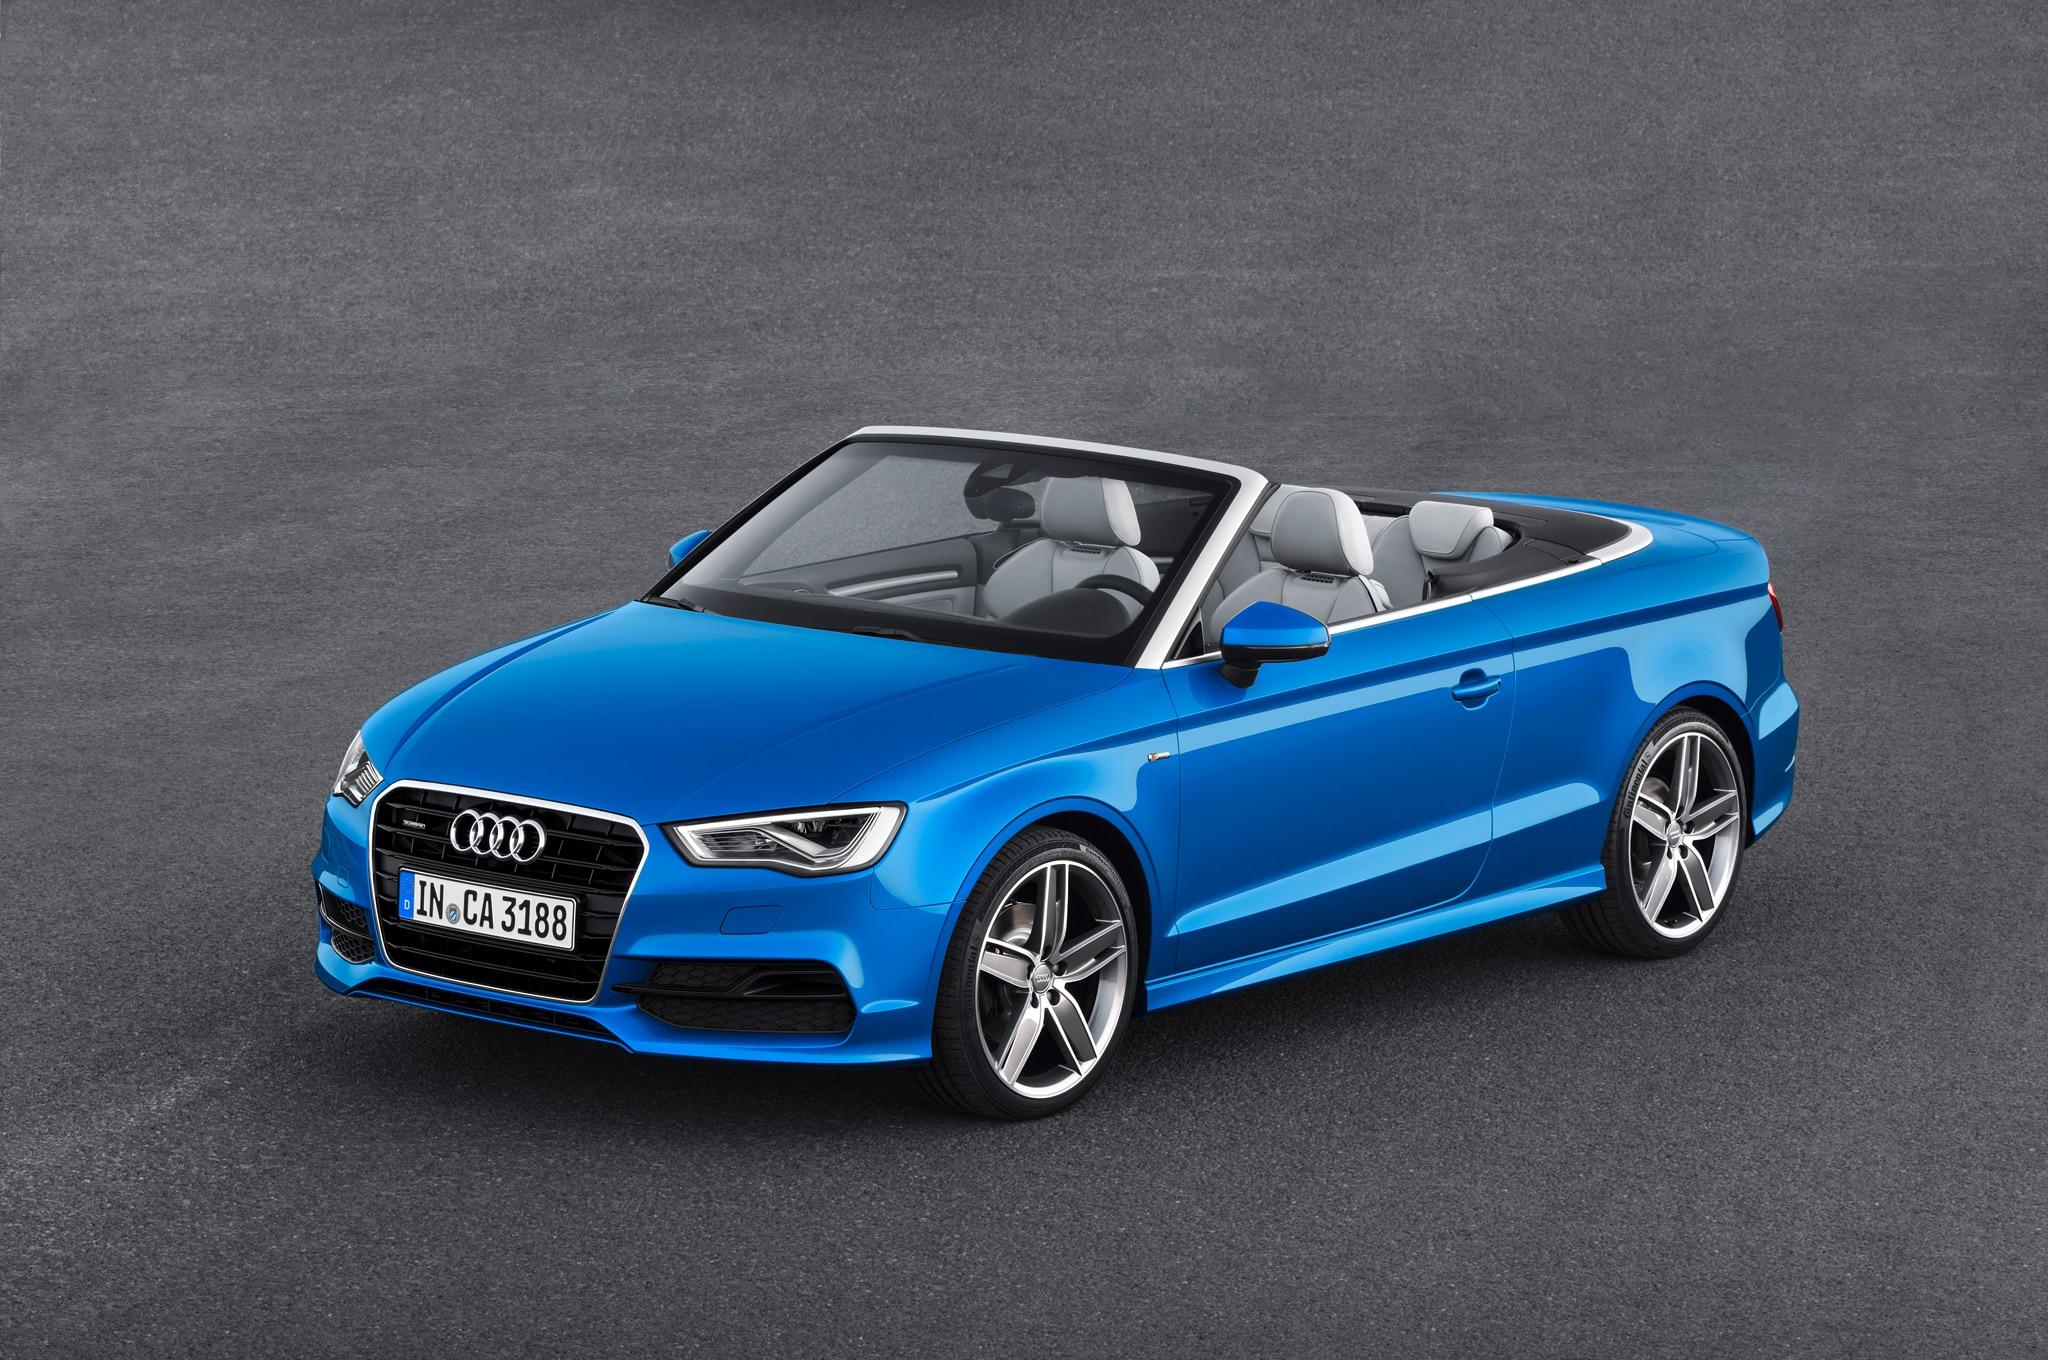 sedan quarters trend reviews audi motor and three rating studio cars front msrp